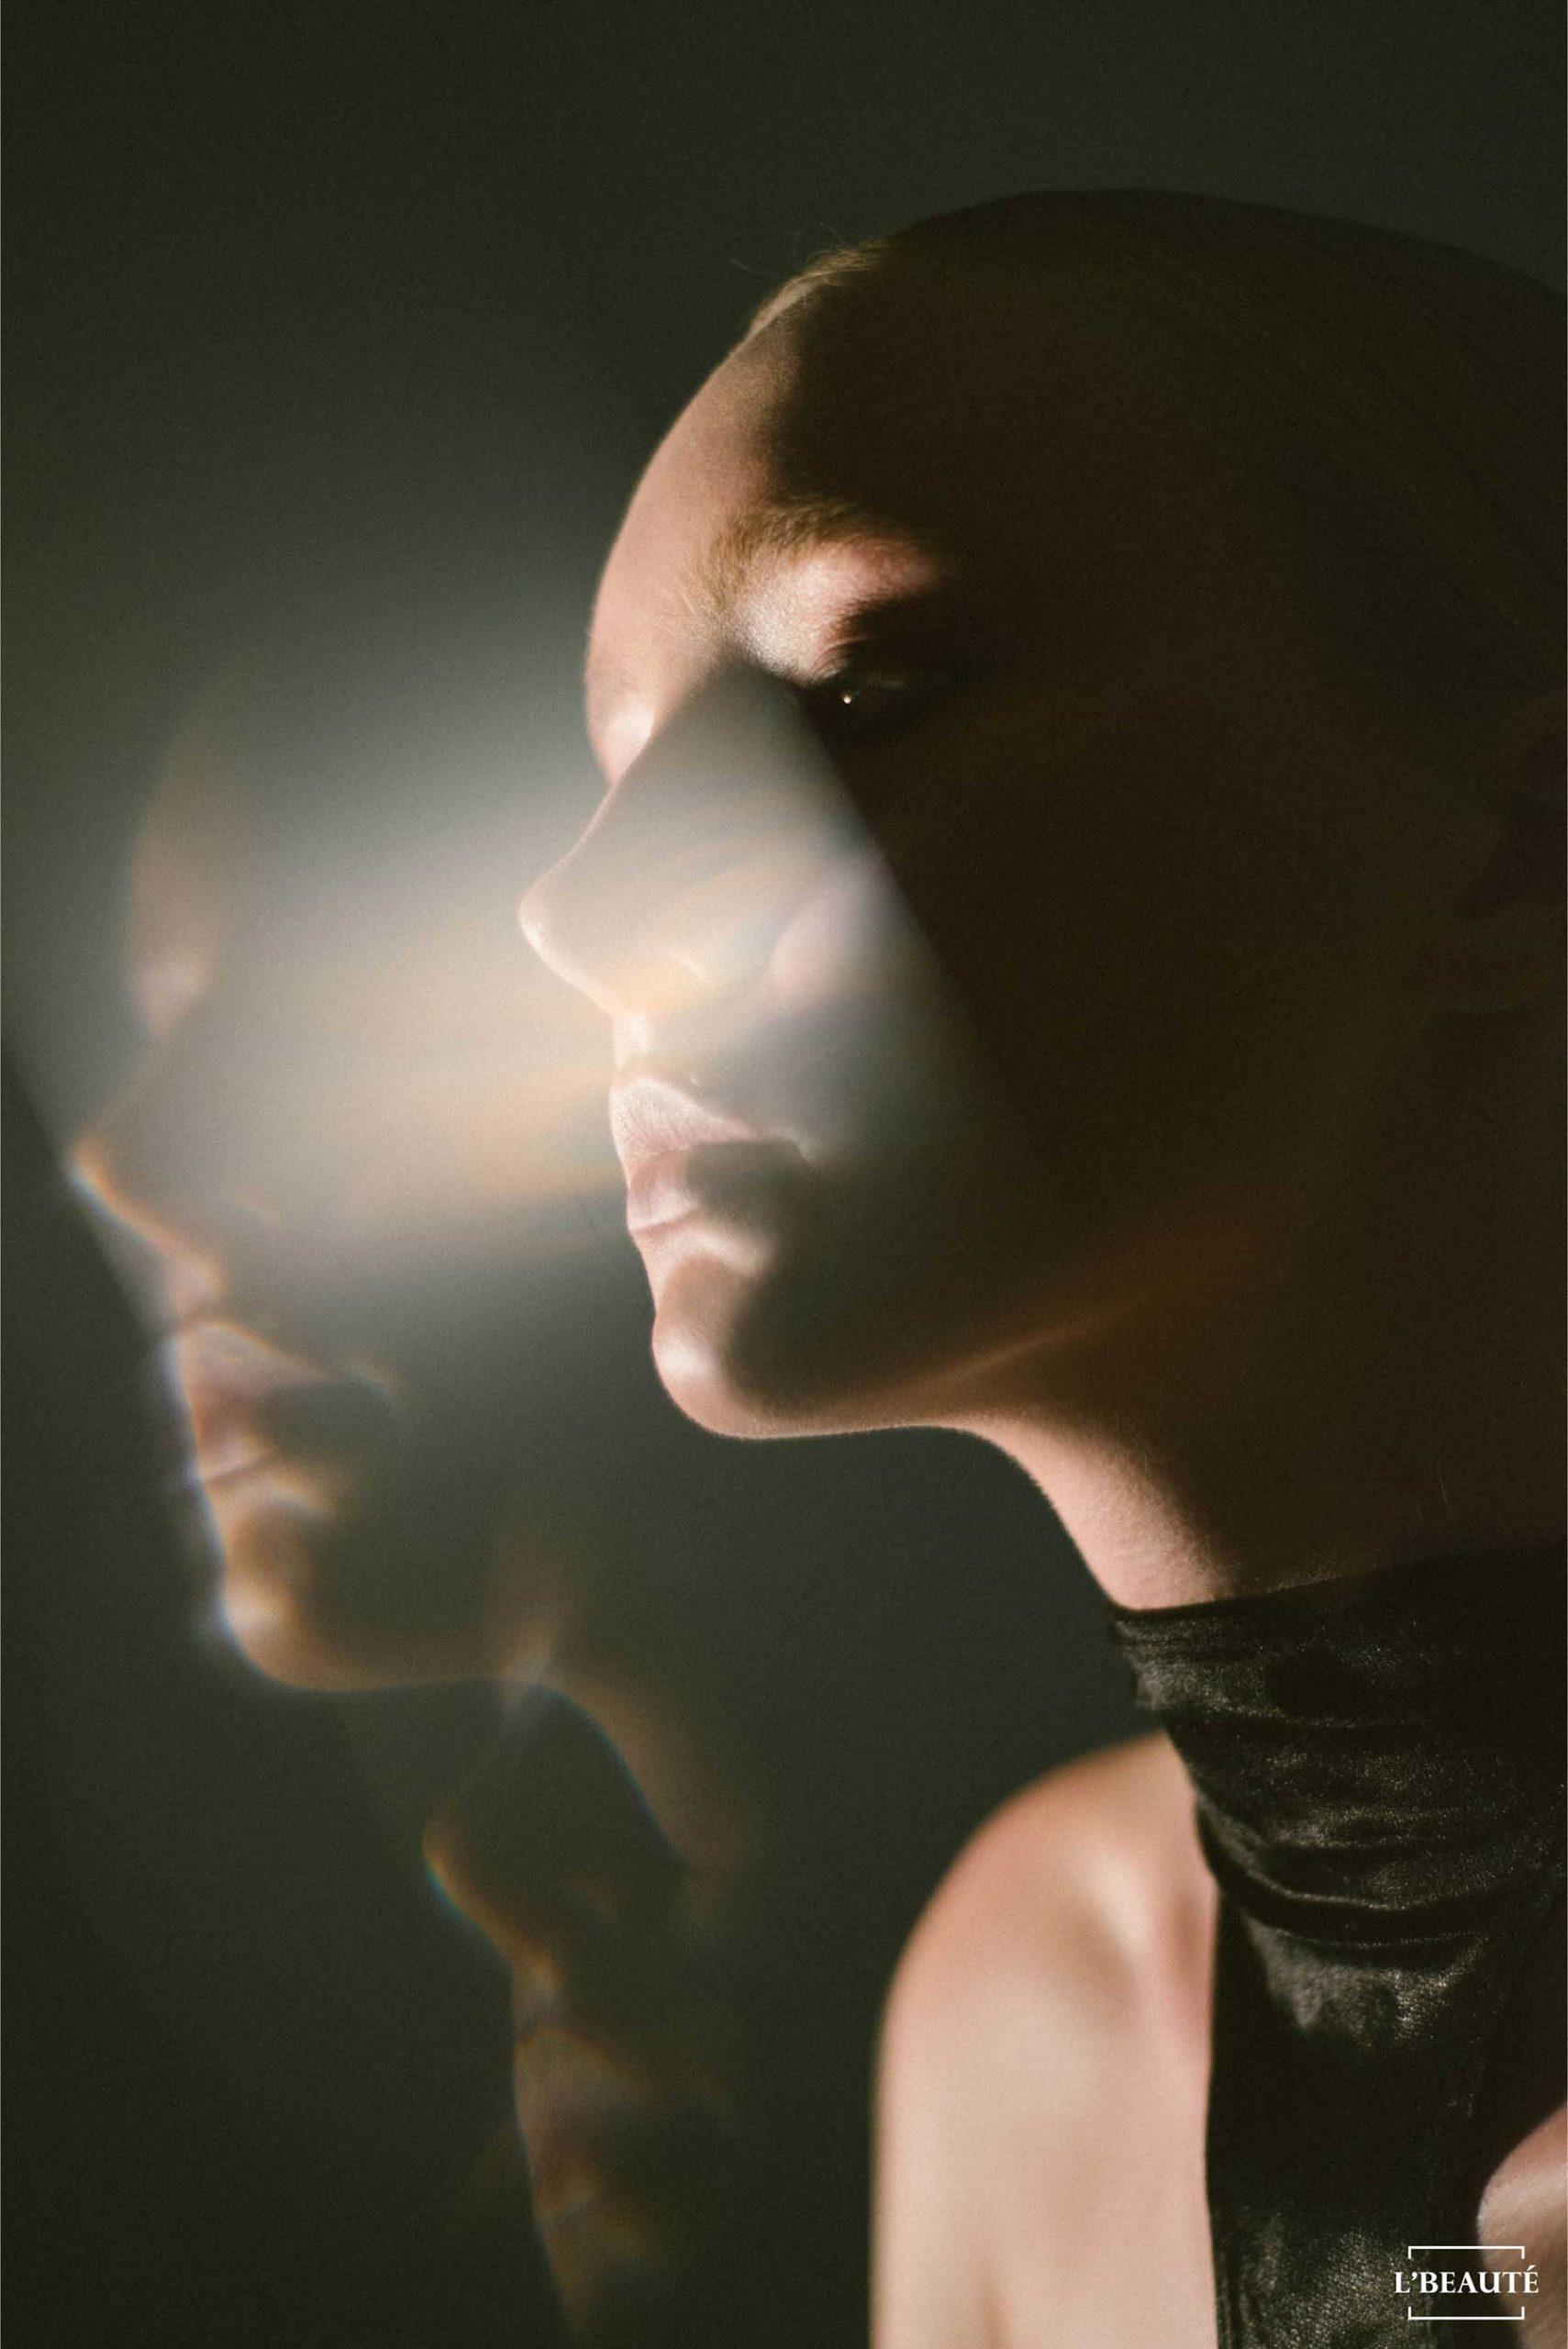 Beauty-Givenchy-Nicolas-Degennes13